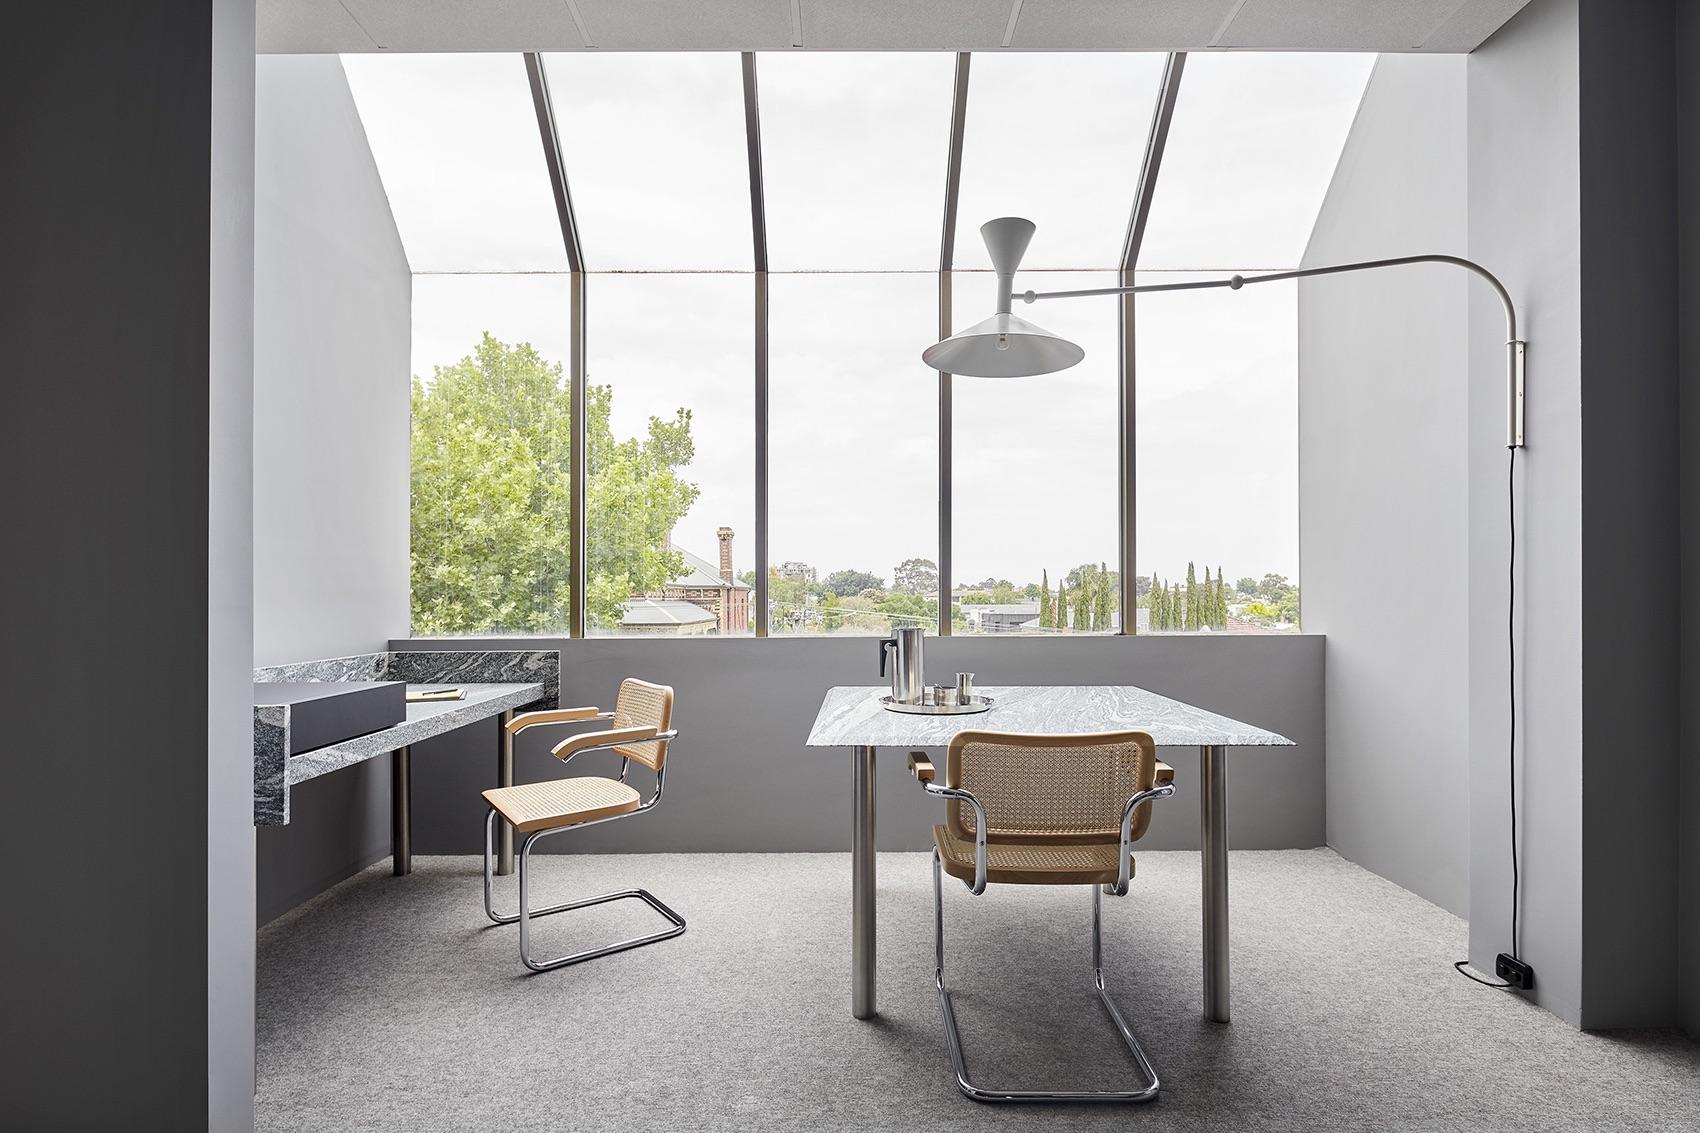 davidov-architects-studio-office-2